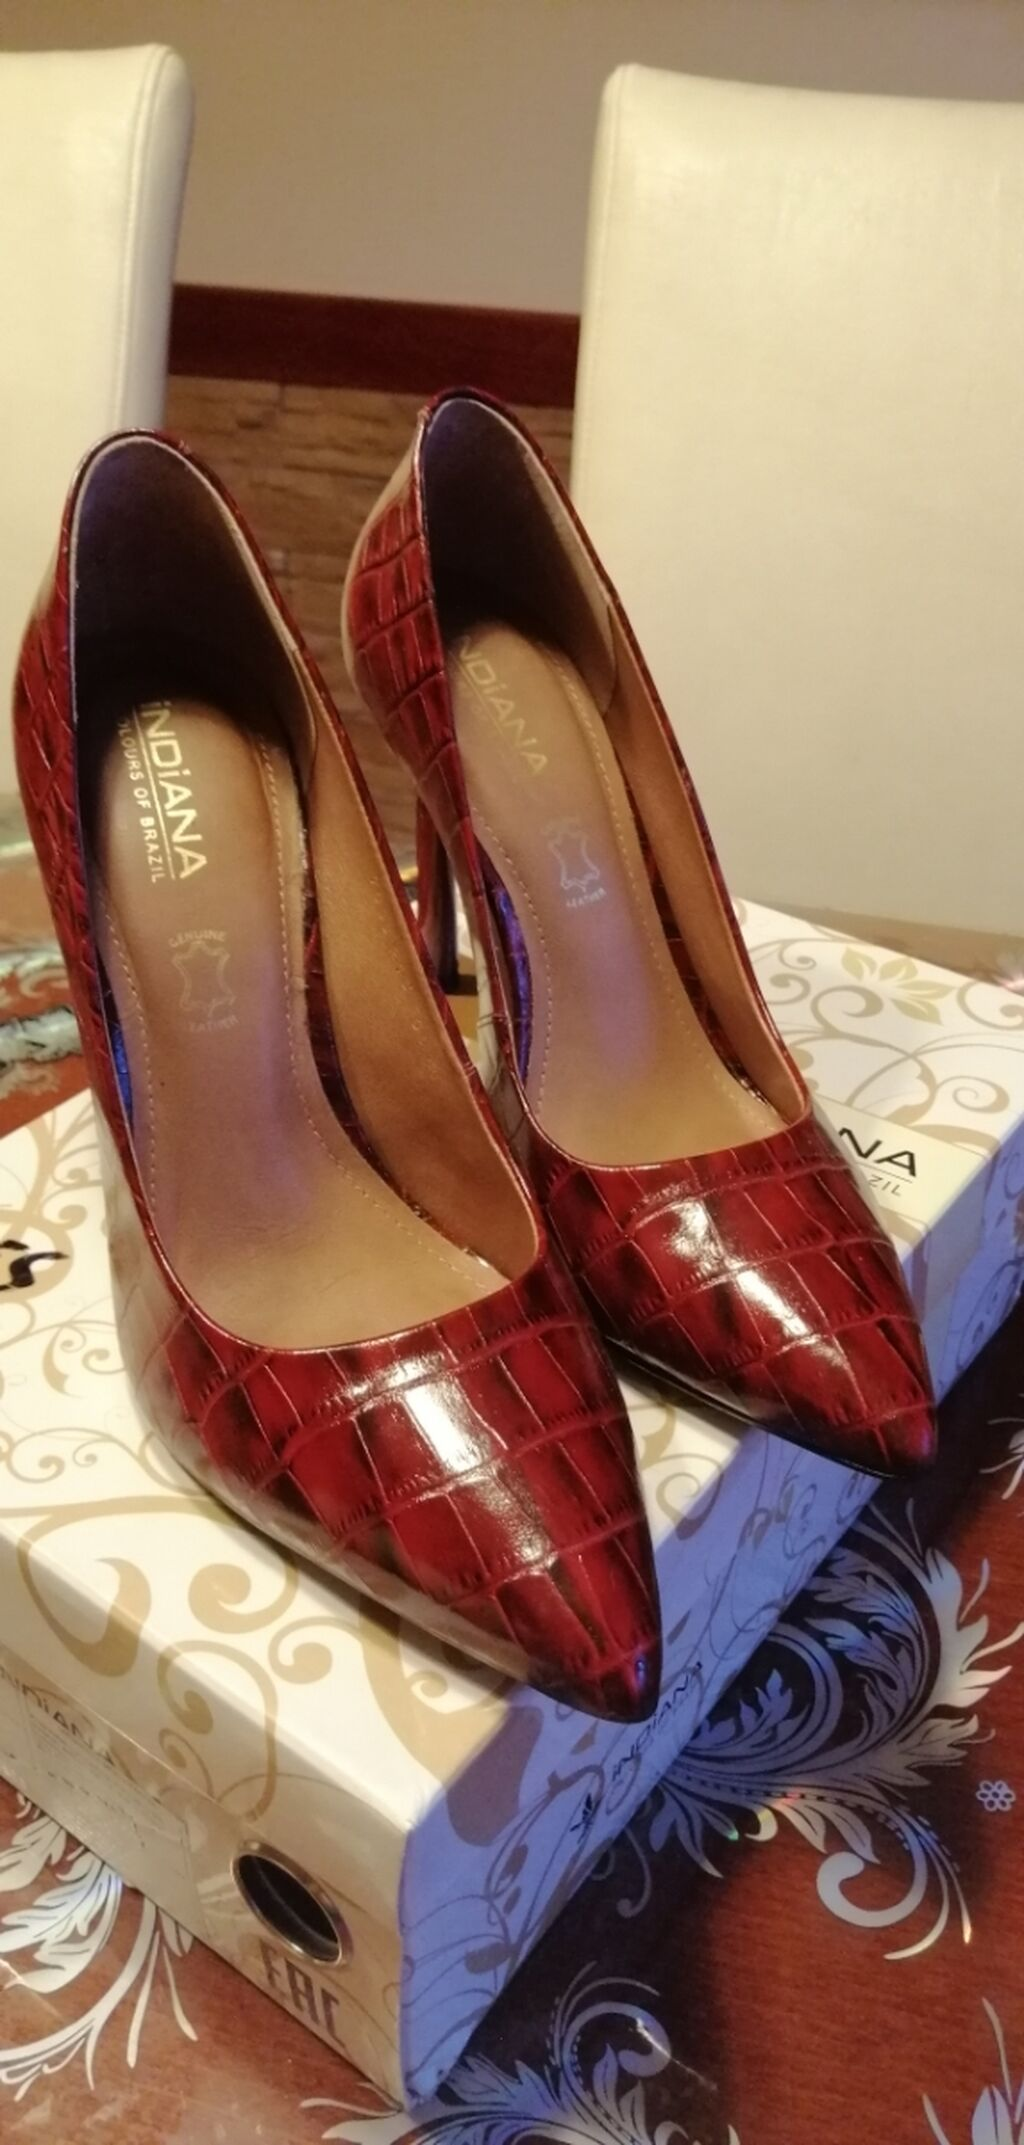 Kožna ženska salonka, jednom obuvena | Oglas postavljen 17 Septembar 2021 15:37:15 | ŽENSKA OBUĆA: Kožna ženska salonka, jednom obuvena